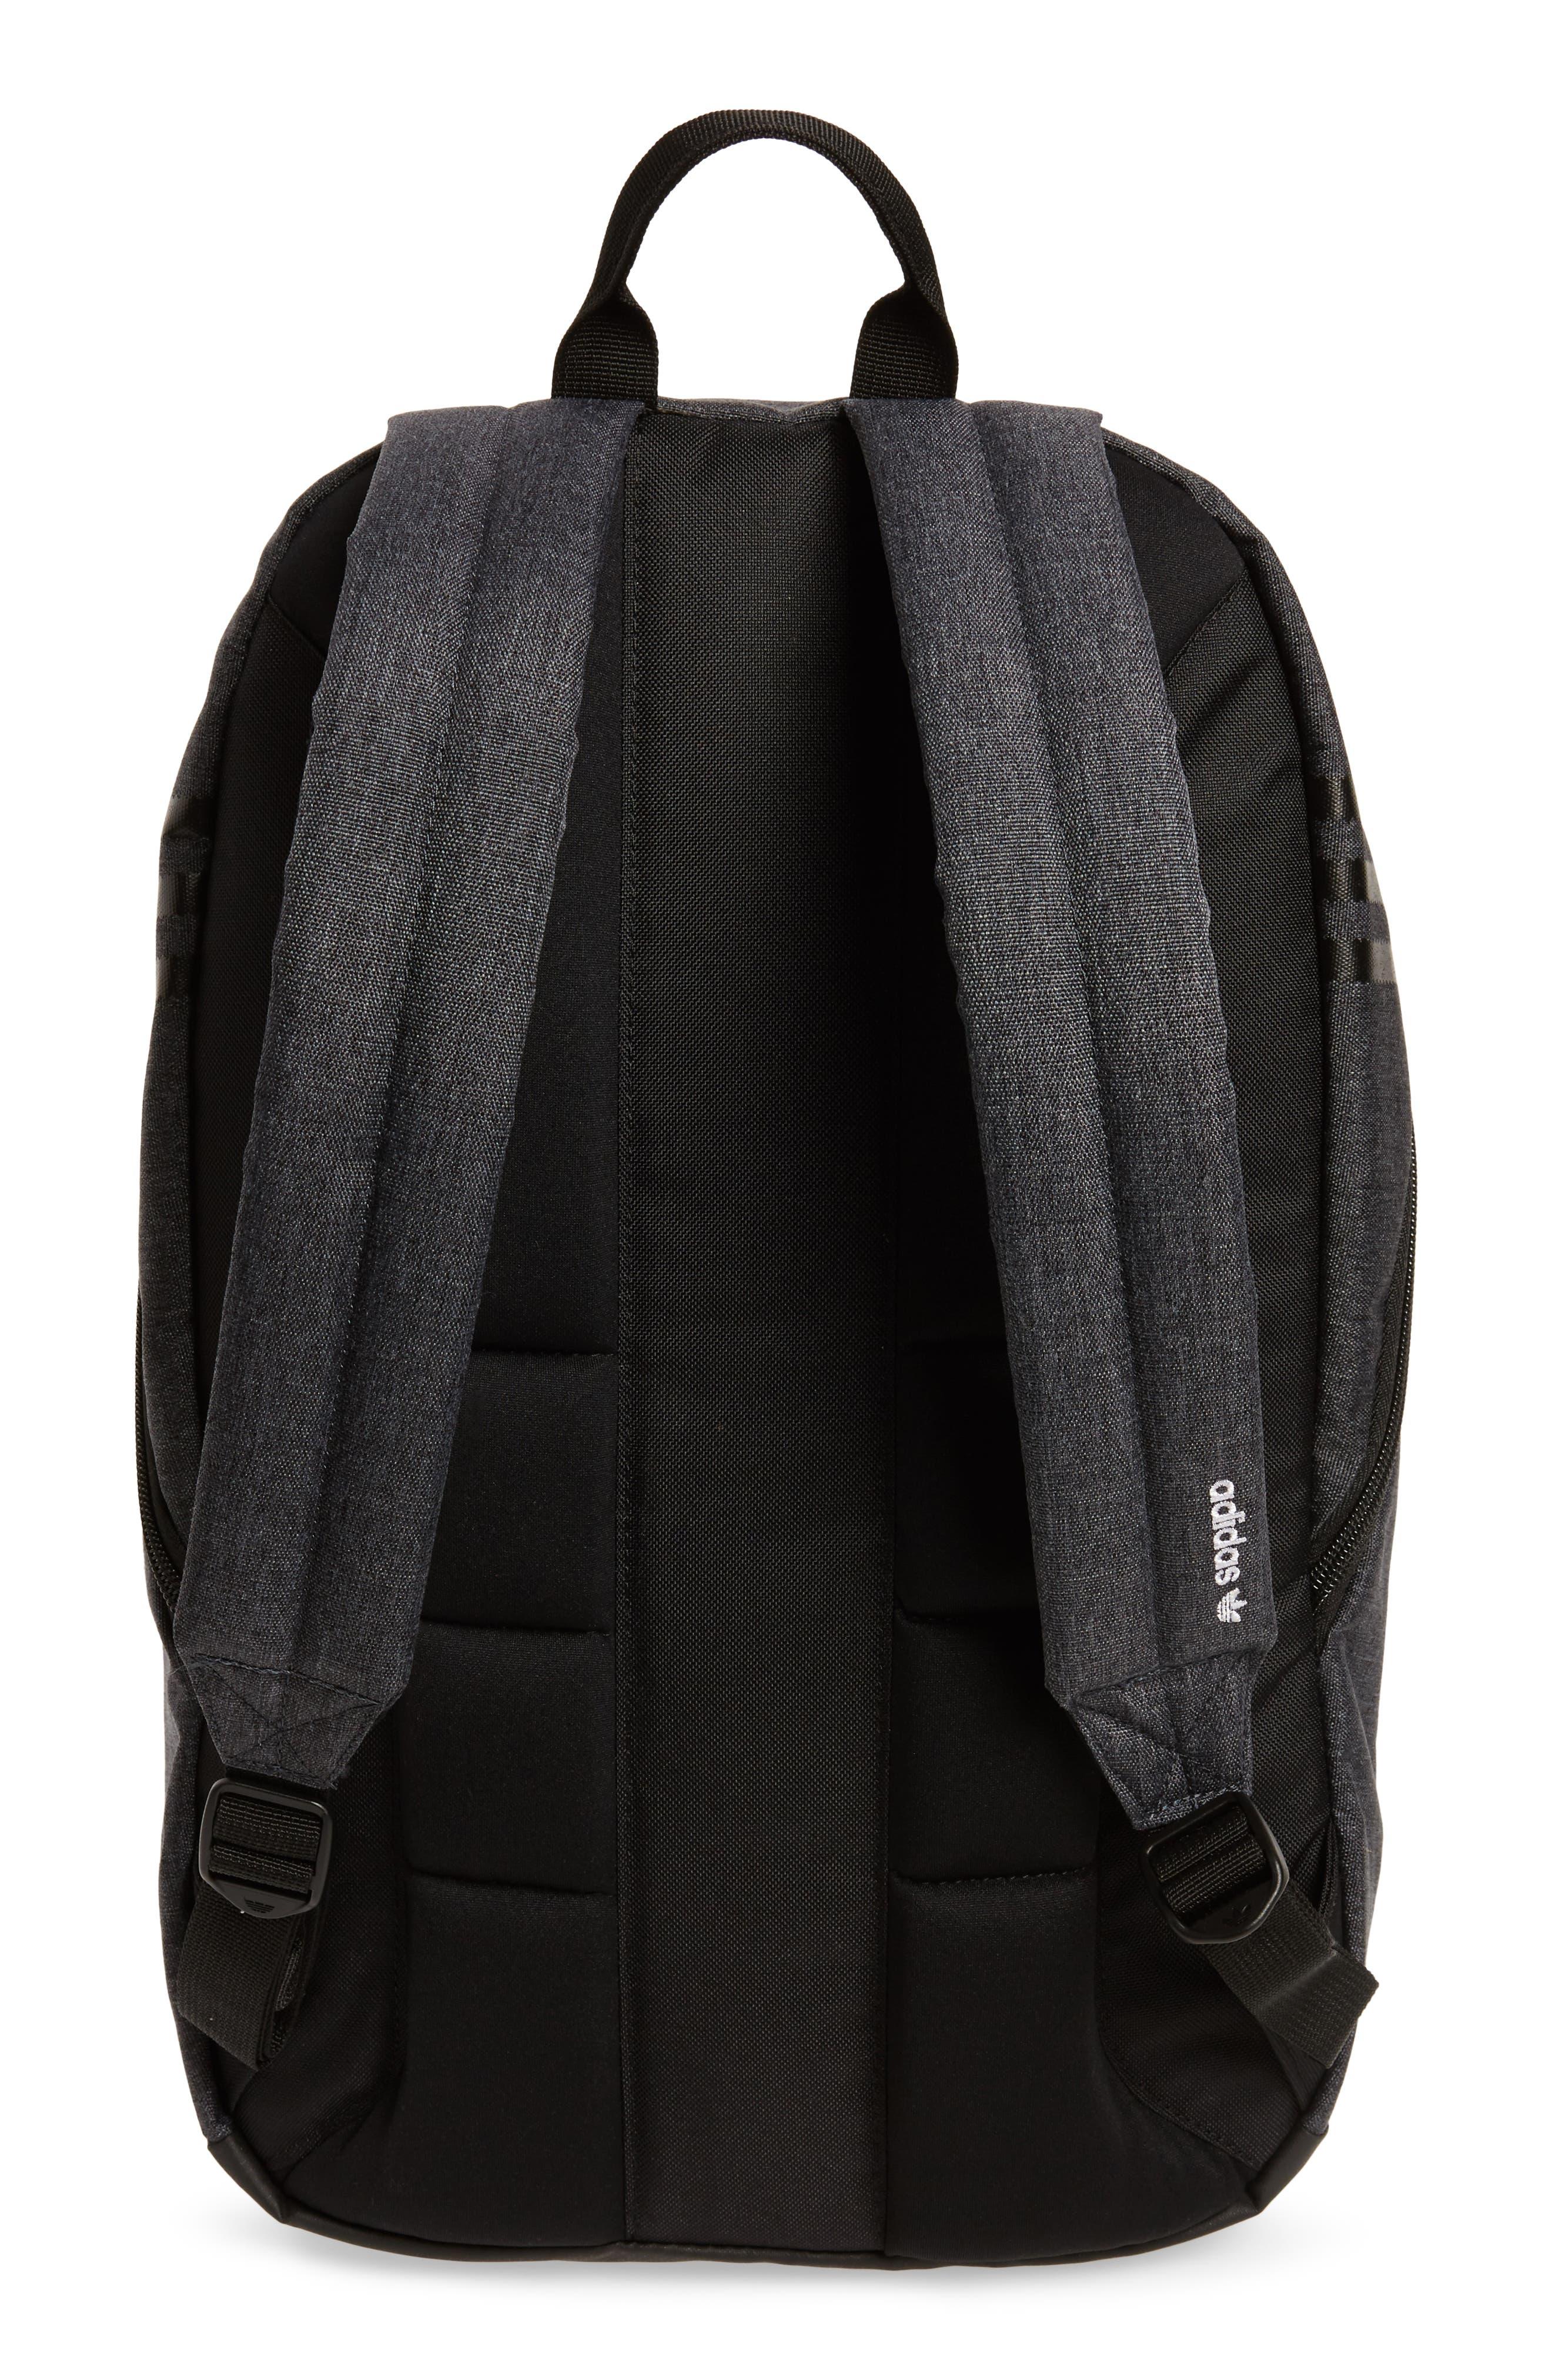 National Plus Backpack,                             Alternate thumbnail 3, color,                             BLACK/ GREY HEATHER/ WHITE